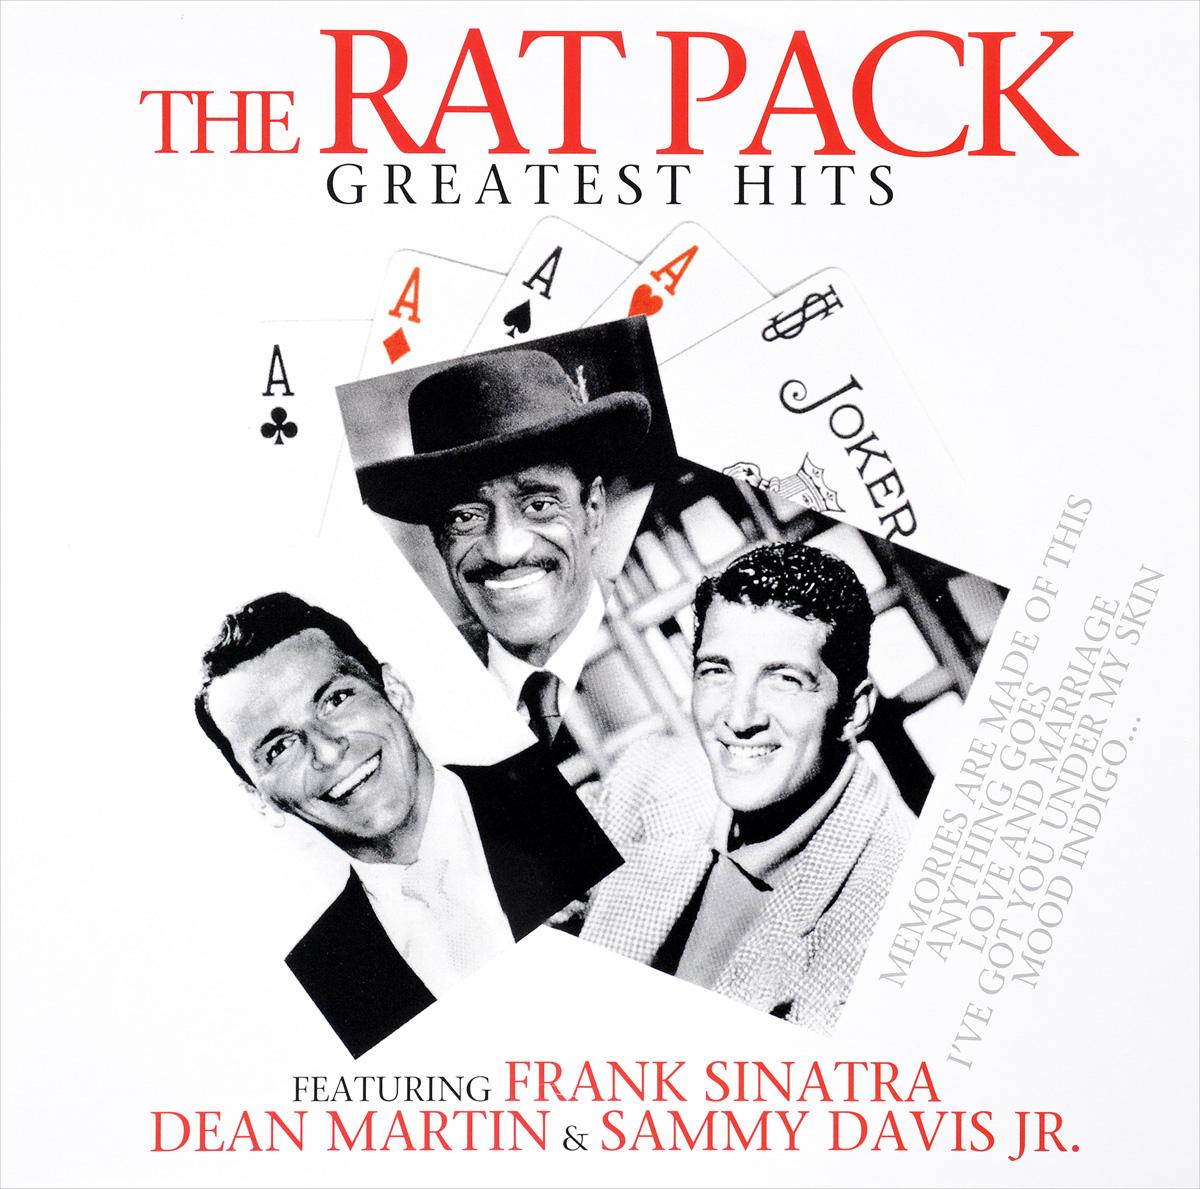 Дин Мартин Frank Sinatra / Dean Martin / Sammy Davis Jr. The Rat Pack Live At The Sands (LP) frank sinatra frank sinatra live at the sands 2 lp 180 gr